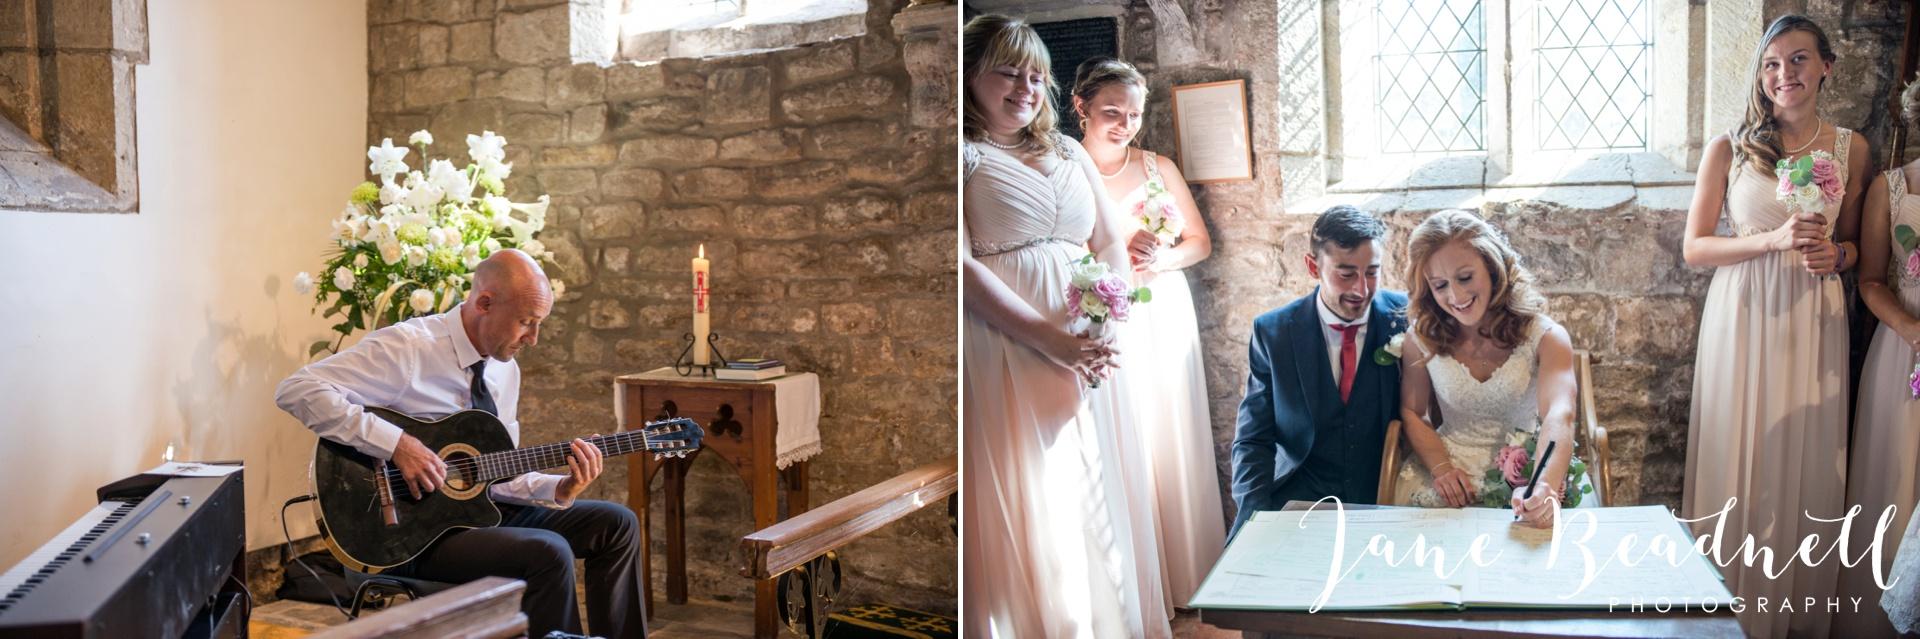 yorkshire-fine-art-wedding-photographer-jane-beadnell-photography-poppleton-york_0055